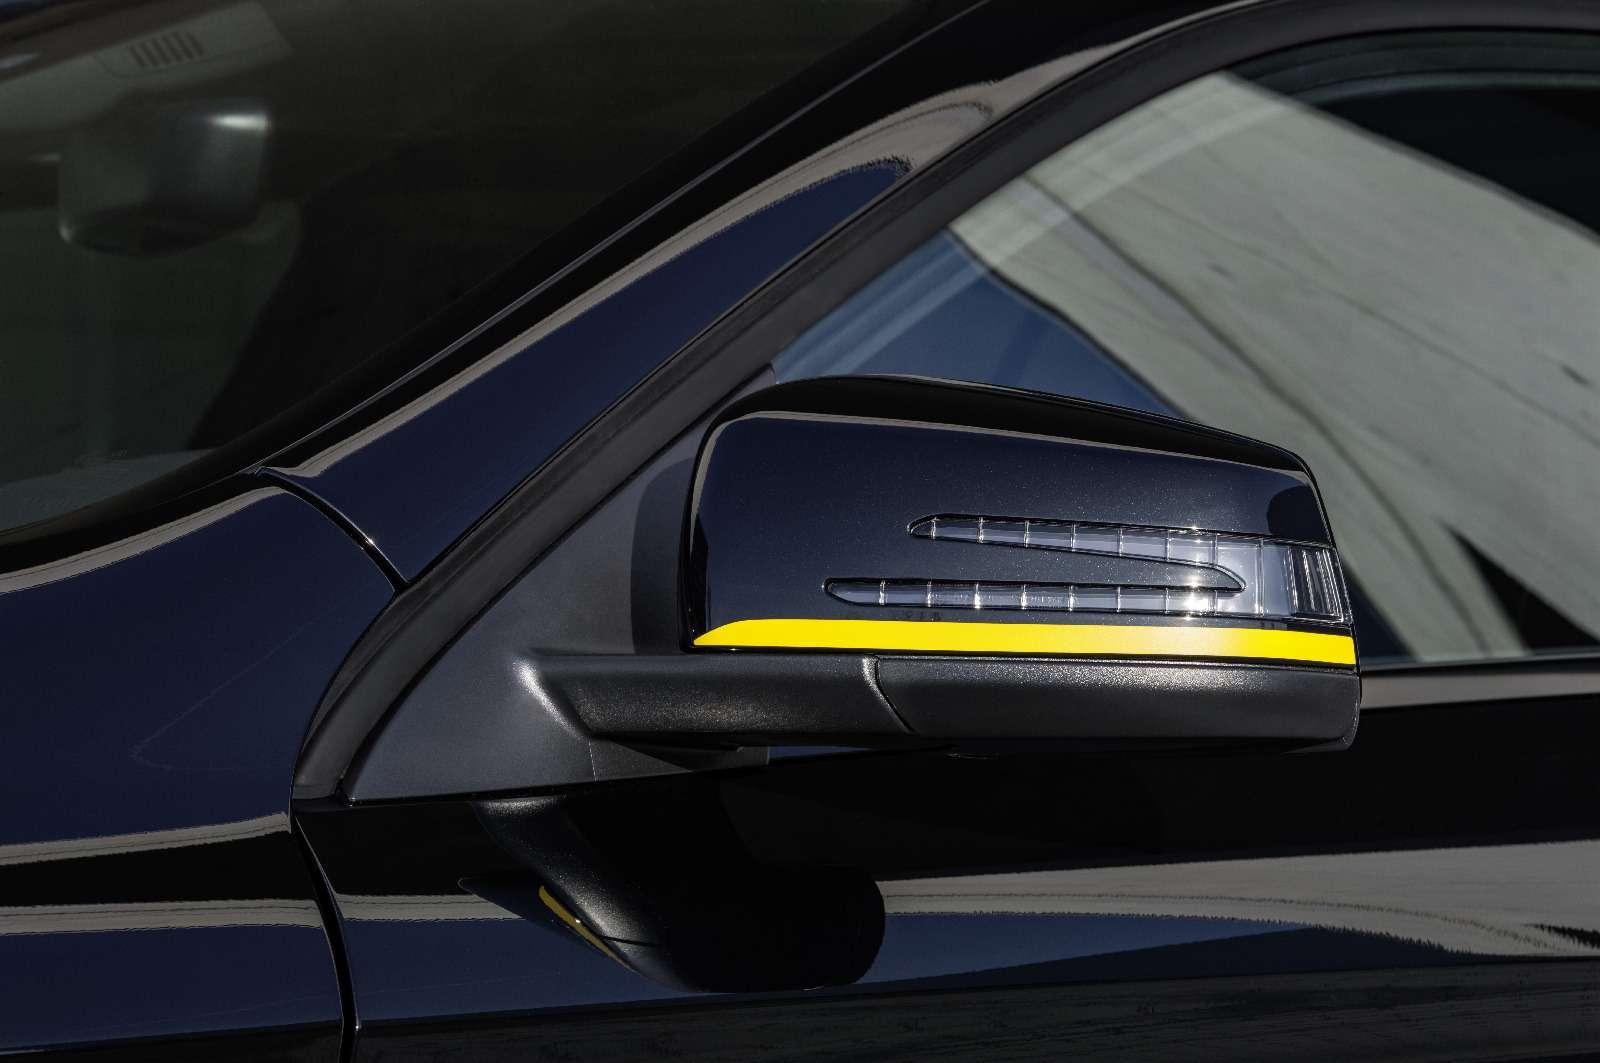 Mercedes-Benz GLA стал краше, нонепросторнее— фото 690080